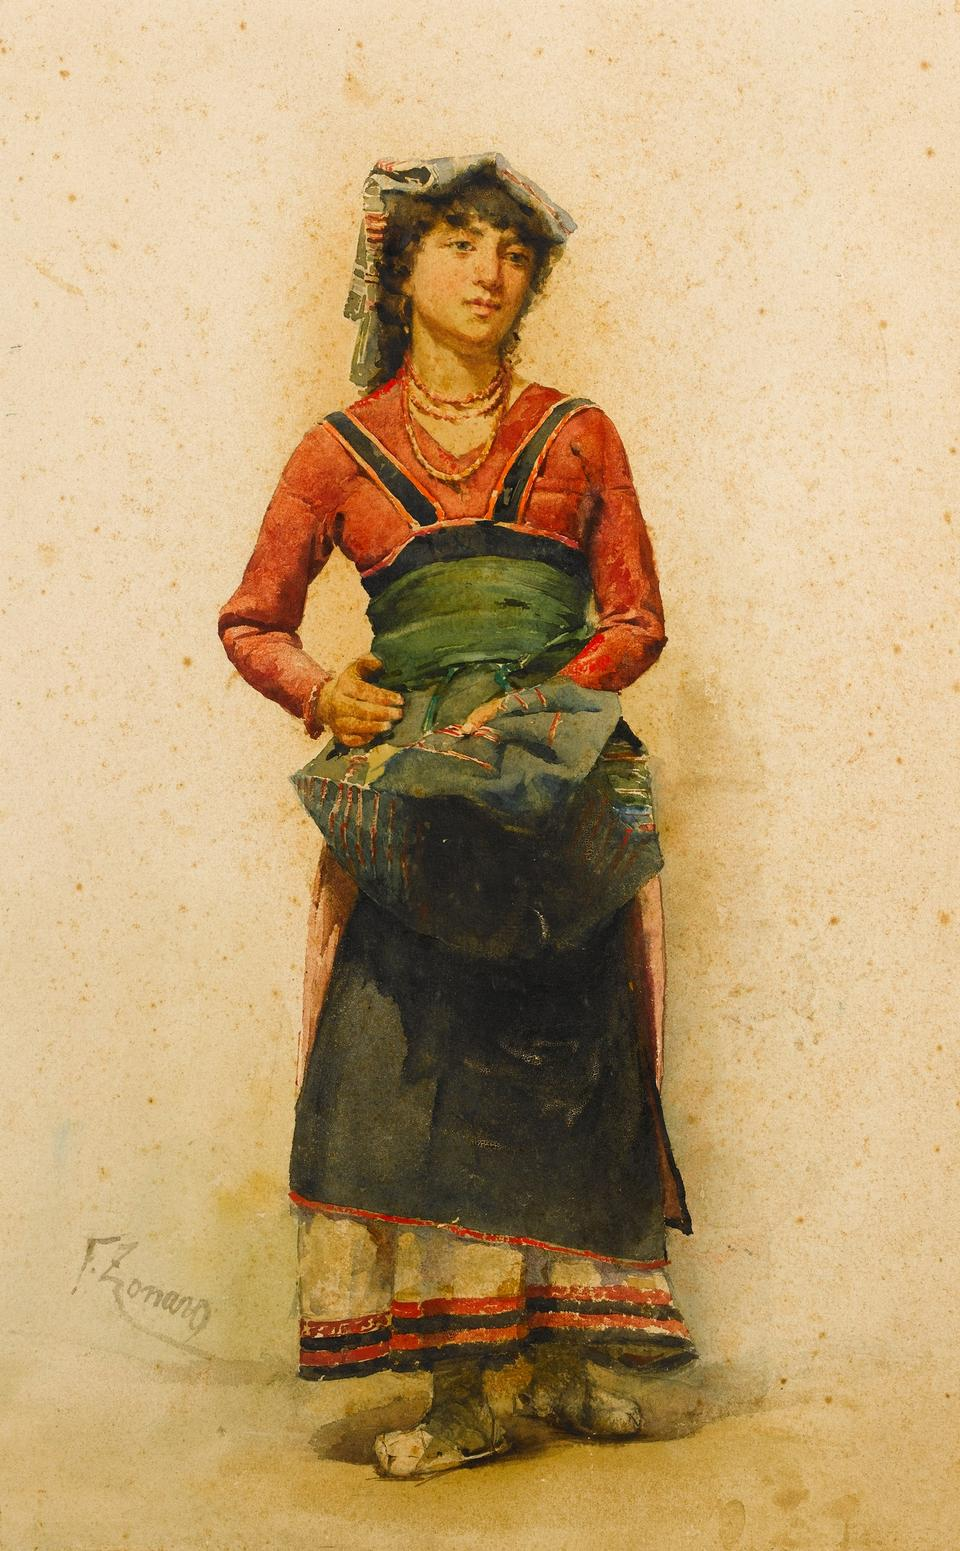 Fausto Zonaro (1854-1929). A Woman. Watercolor on paper, 50 x 31.5 cm